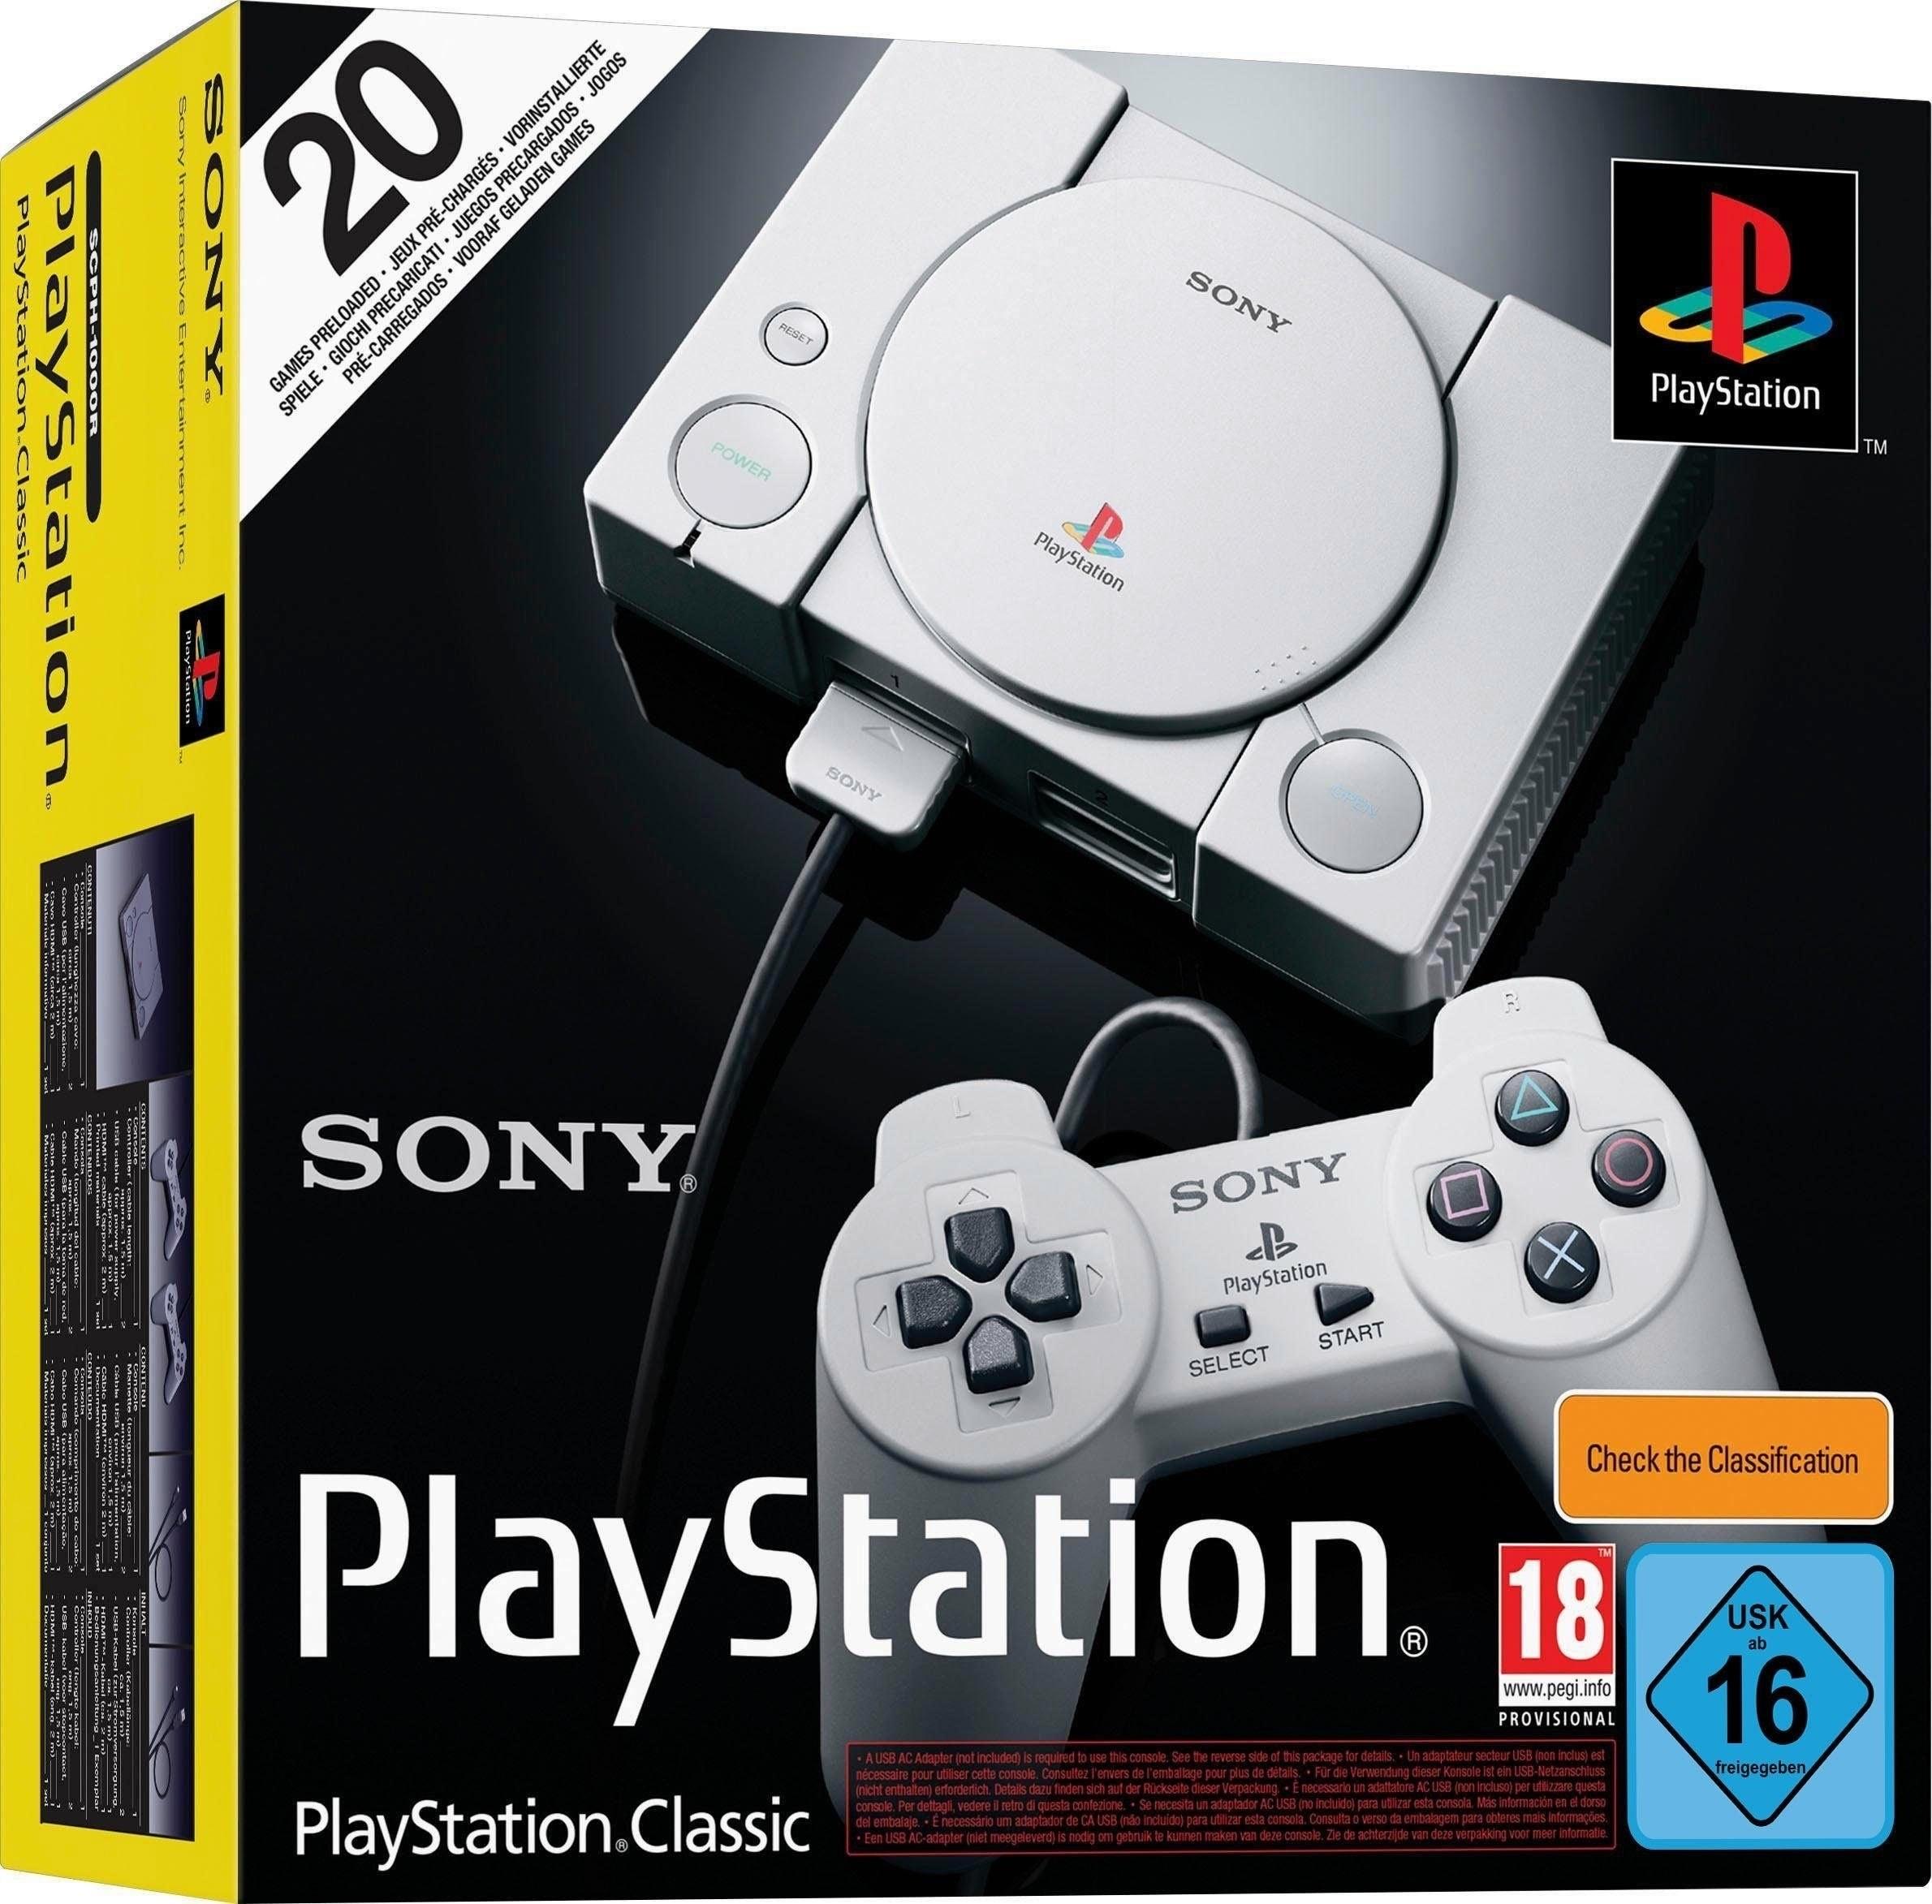 [B-Ware] Sony Playstation Classic Mini Konsole inkl. 20 Spiele + 2 Controller